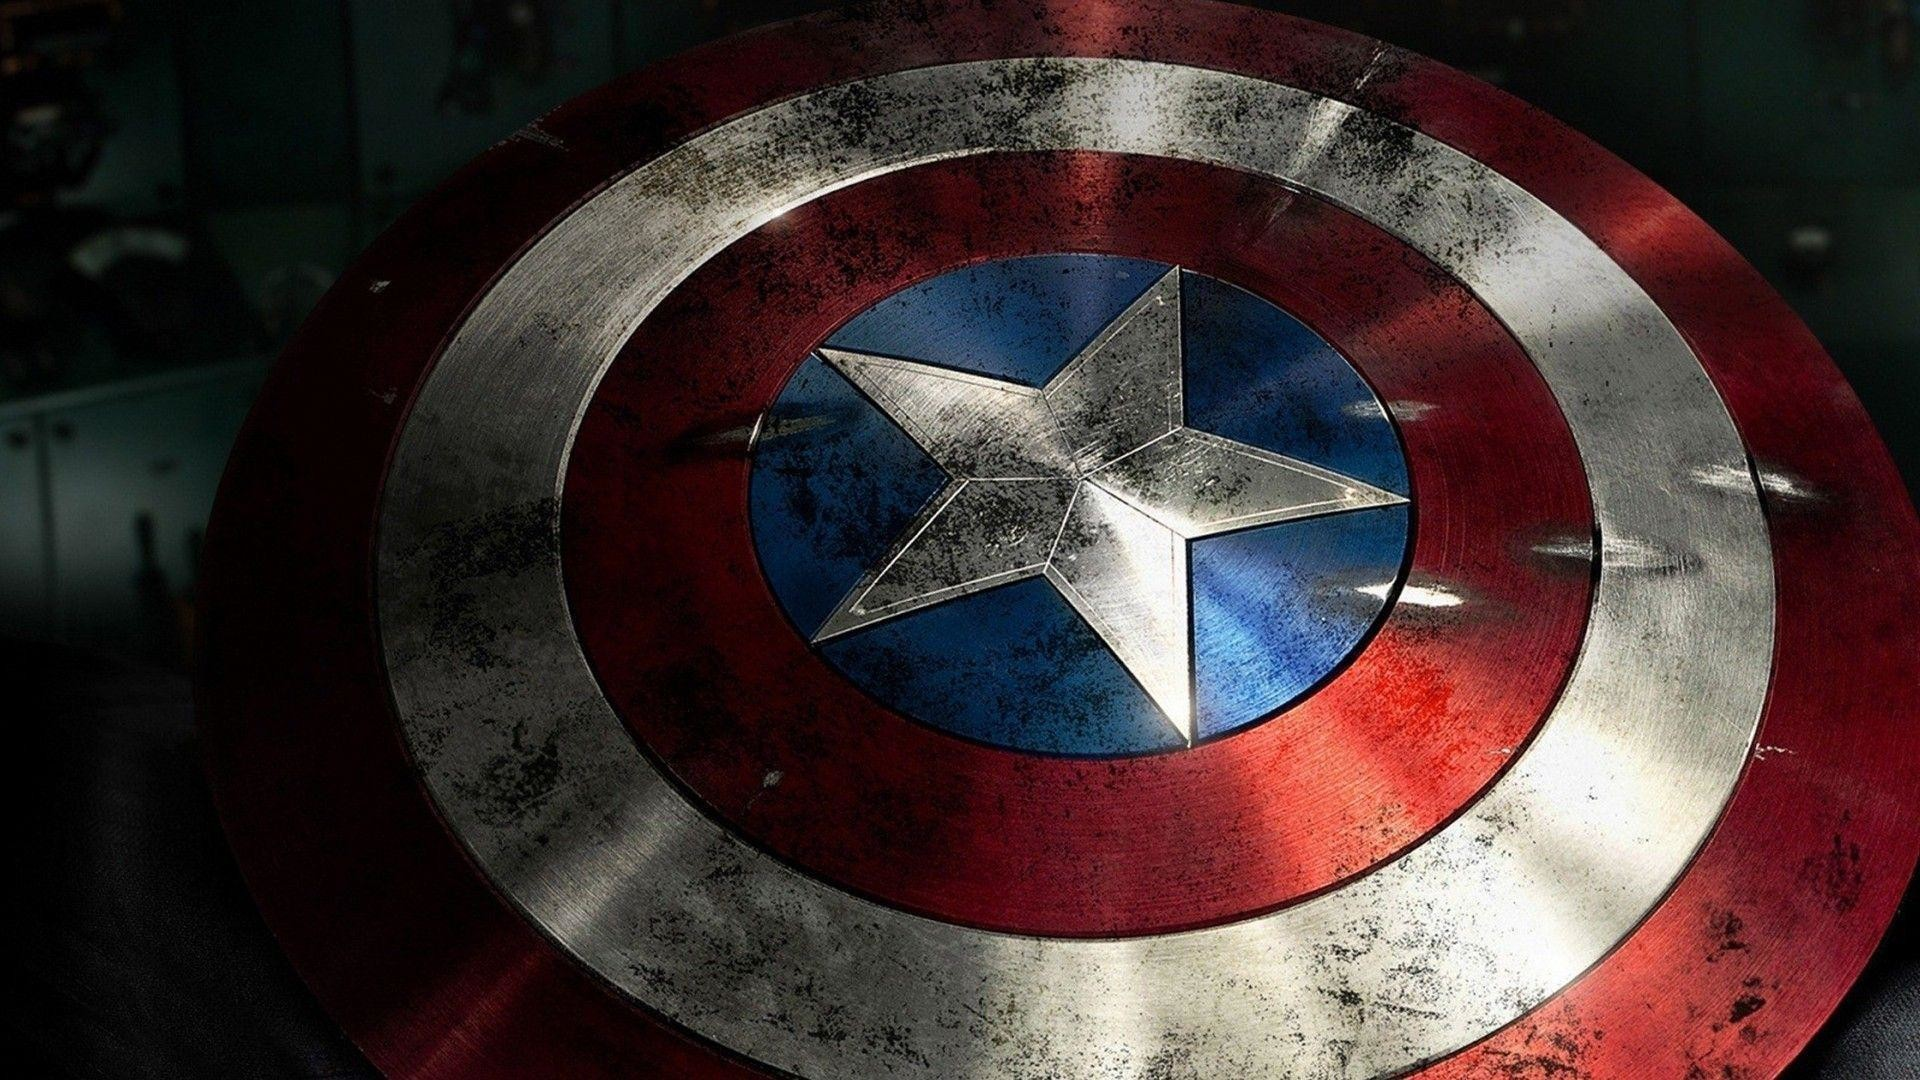 Superhero wallpaper: Vibranium by Ninja-of-Athens on DeviantArt